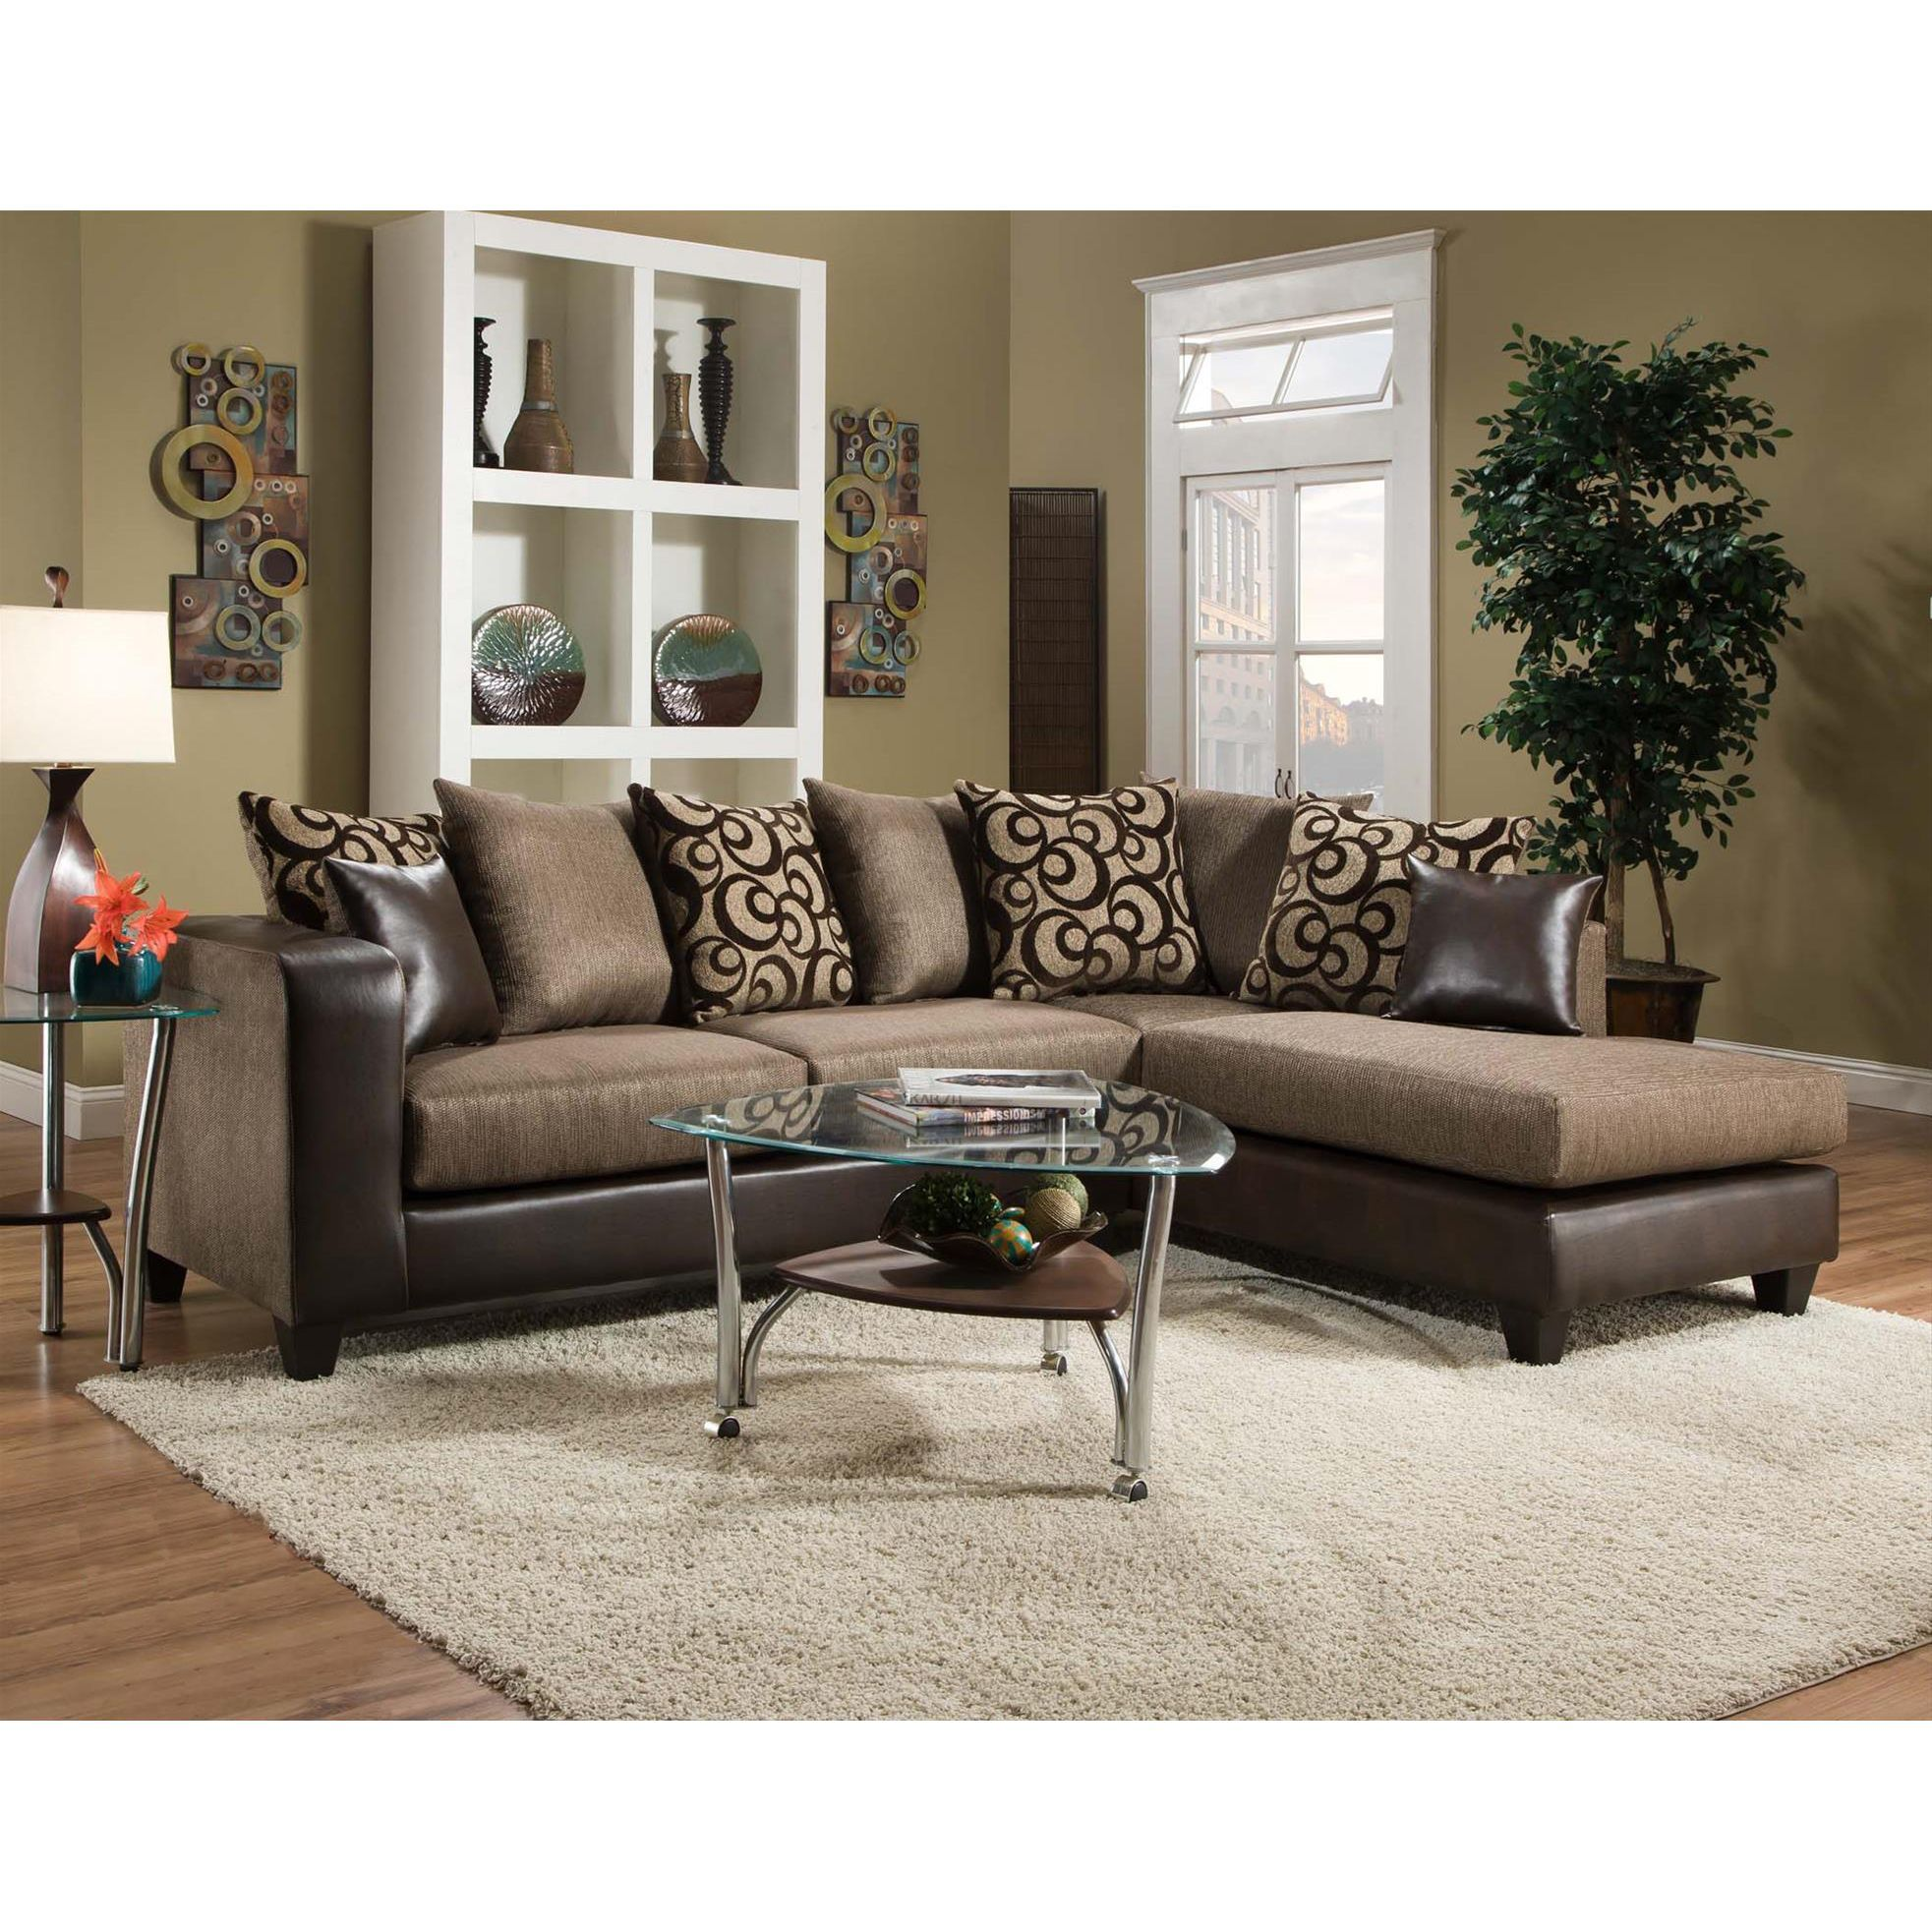 Sofa trendz oliver espresso sectional oliver sectional espresso brown fabric